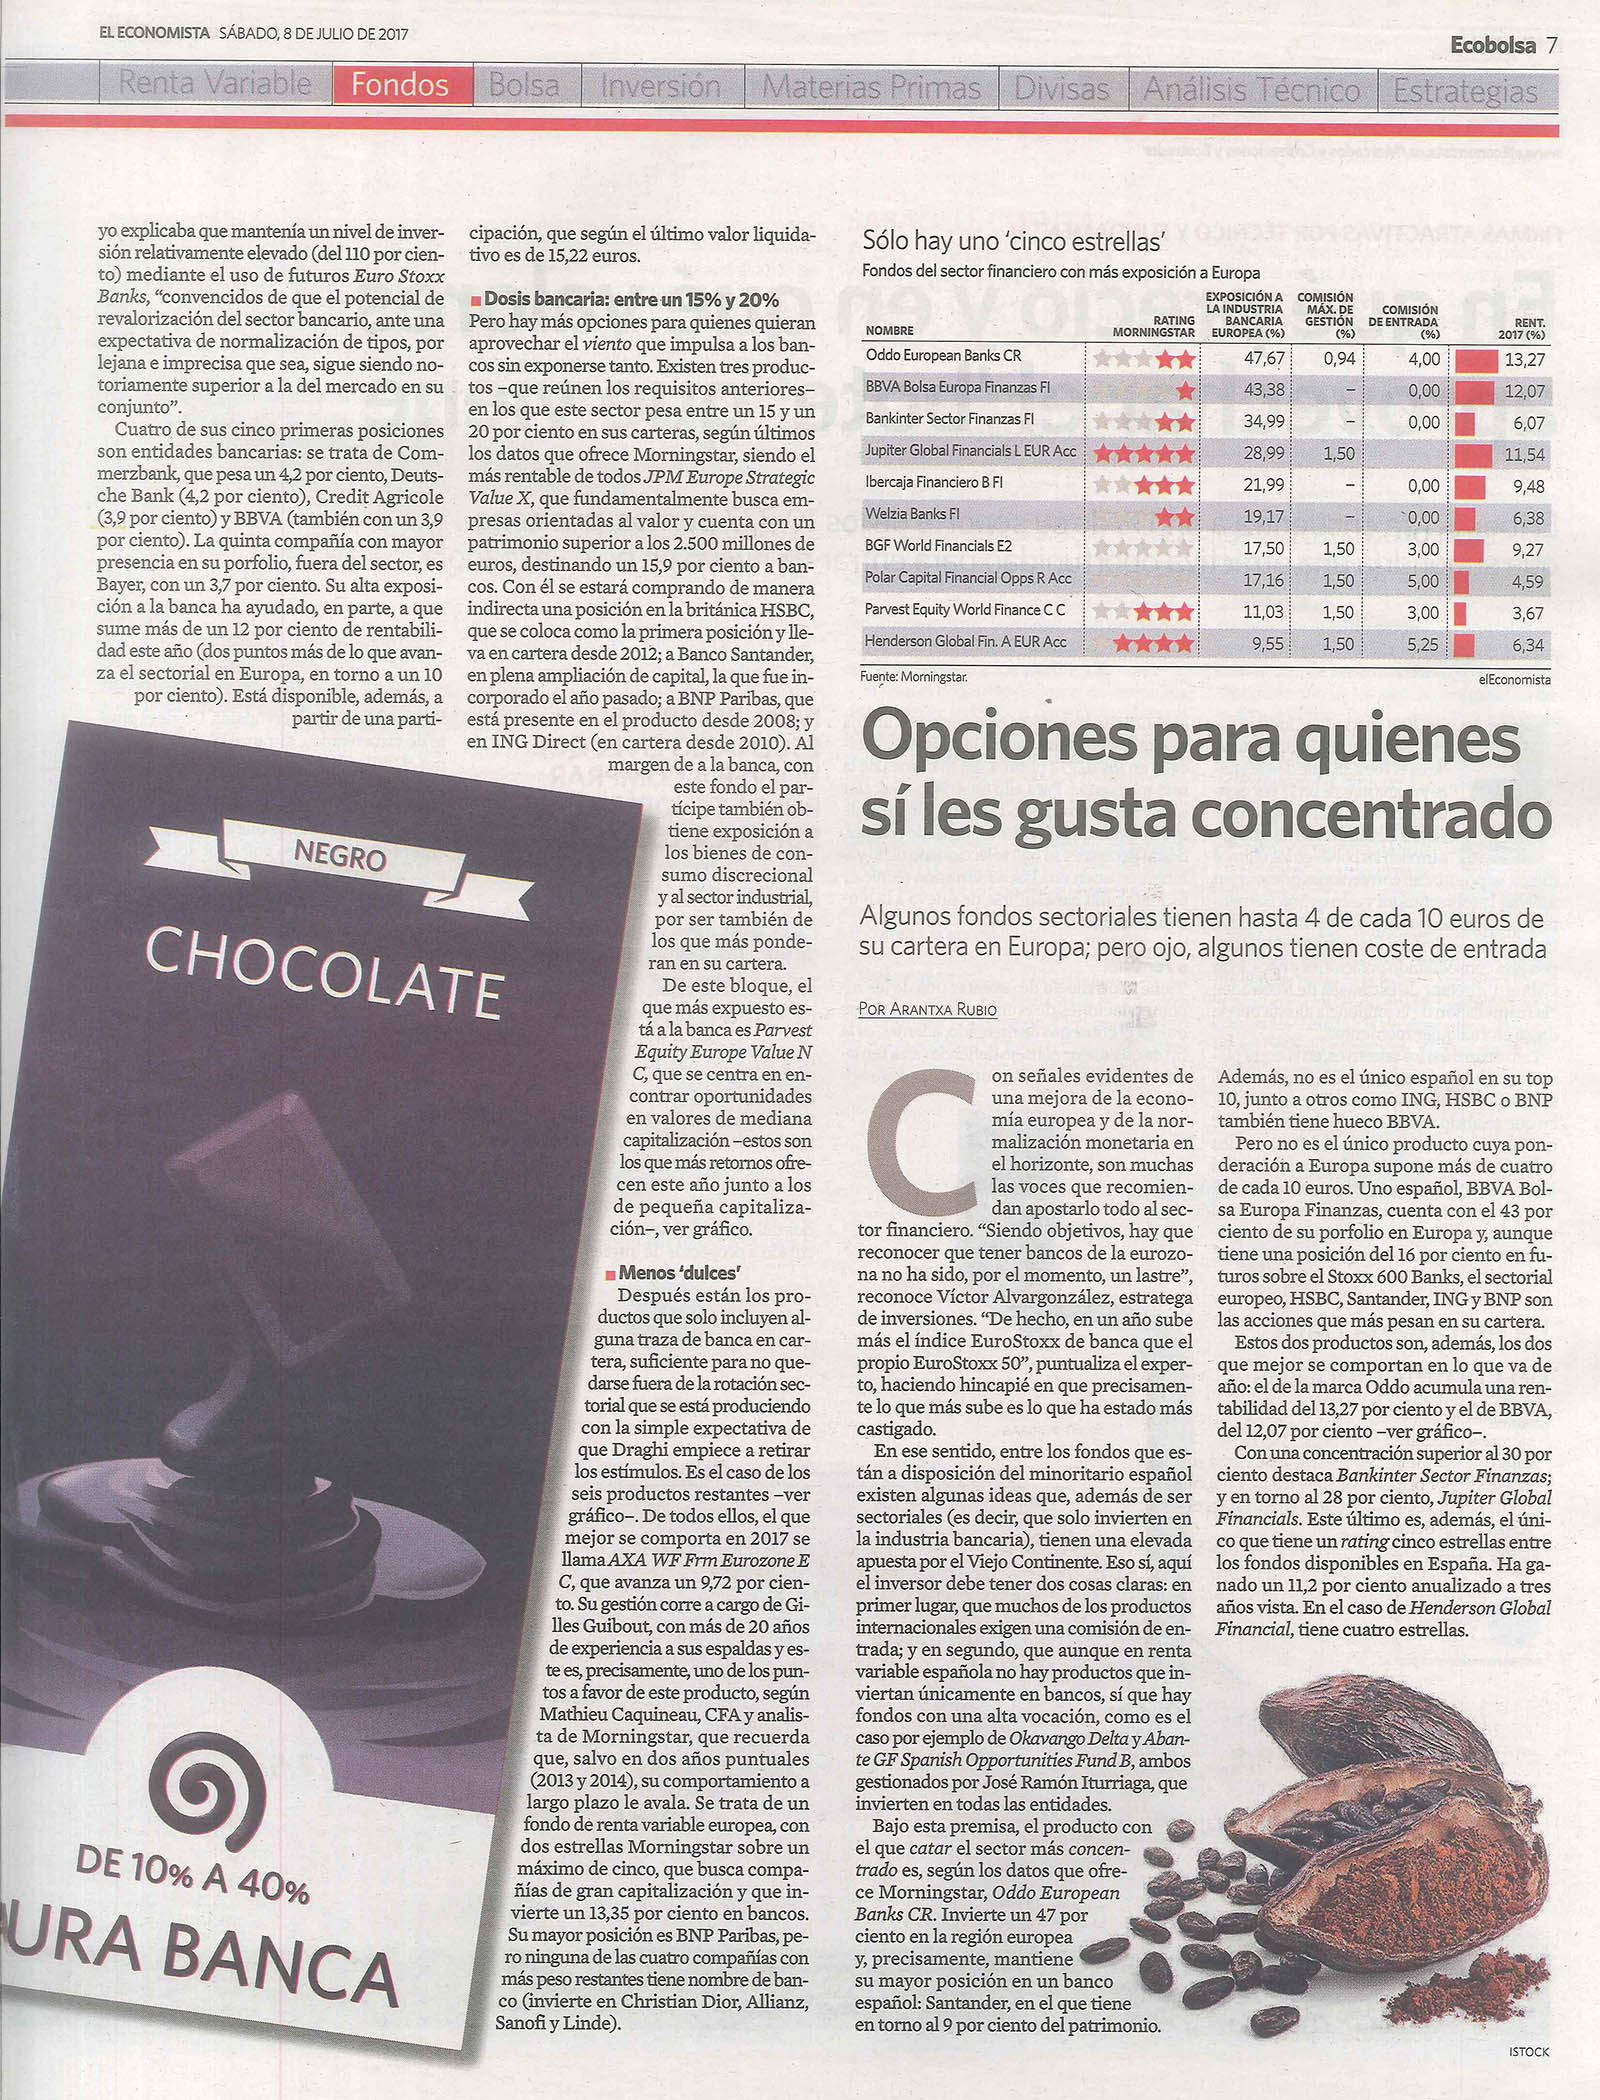 20170710 El Economista Josep Prats European fondos banca 2